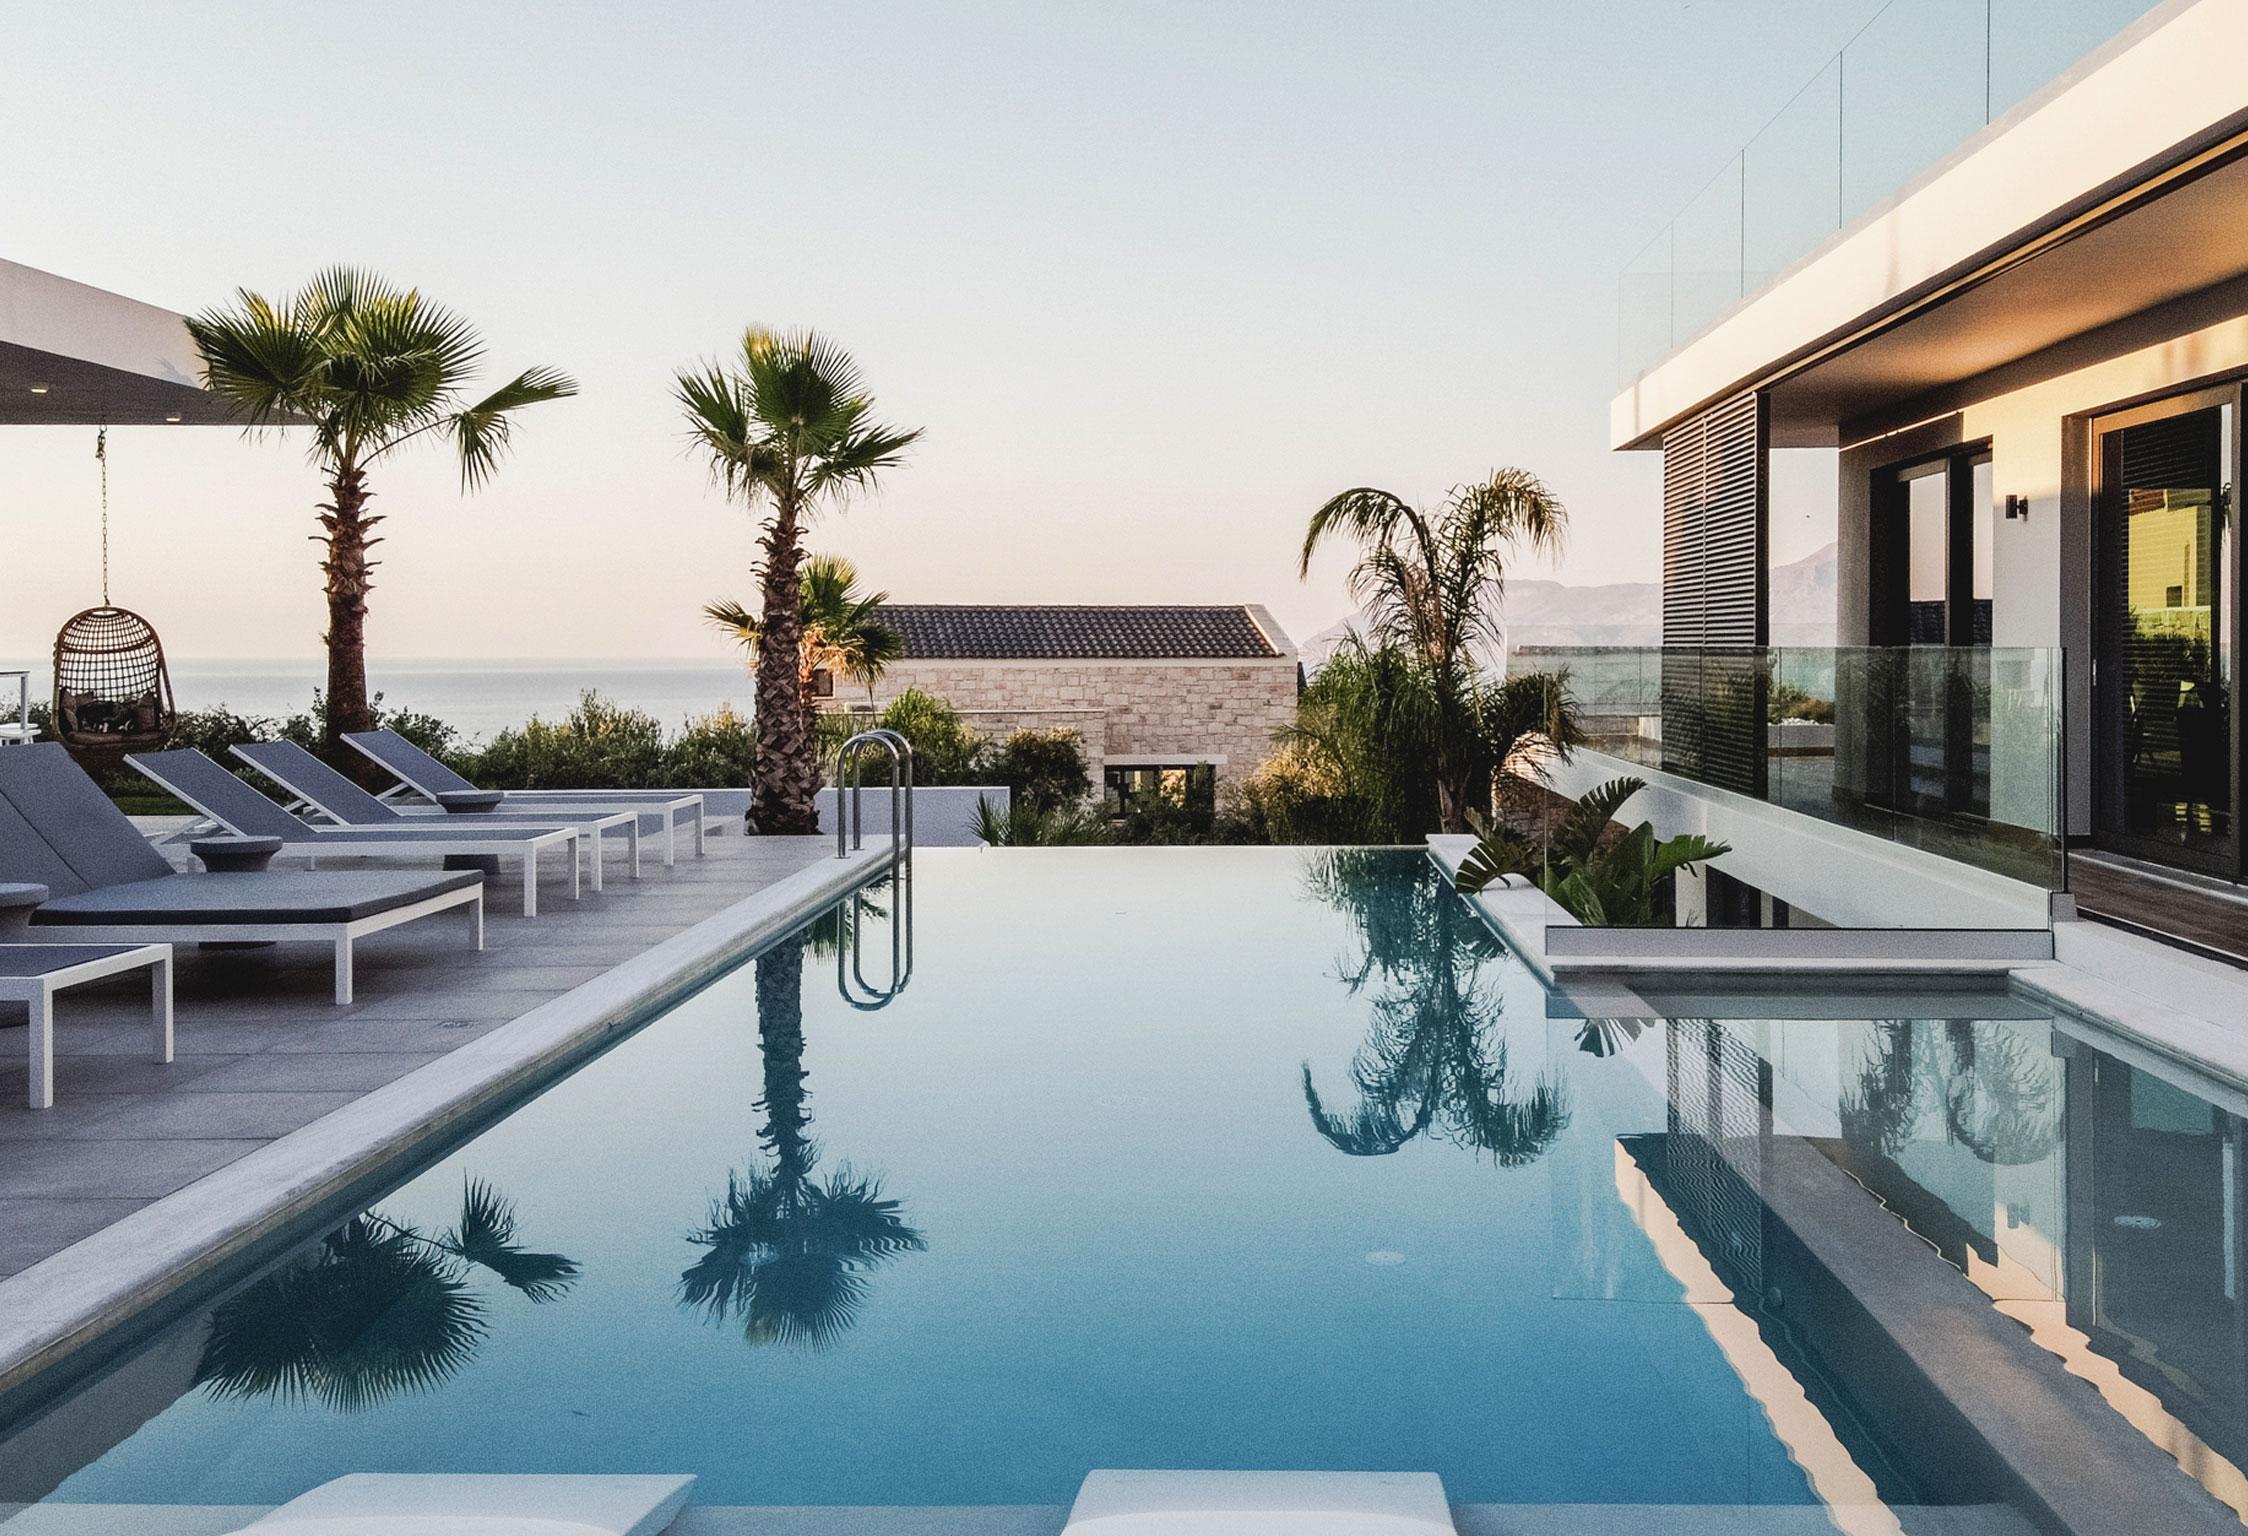 Crete Villa Thelma jumbotron image